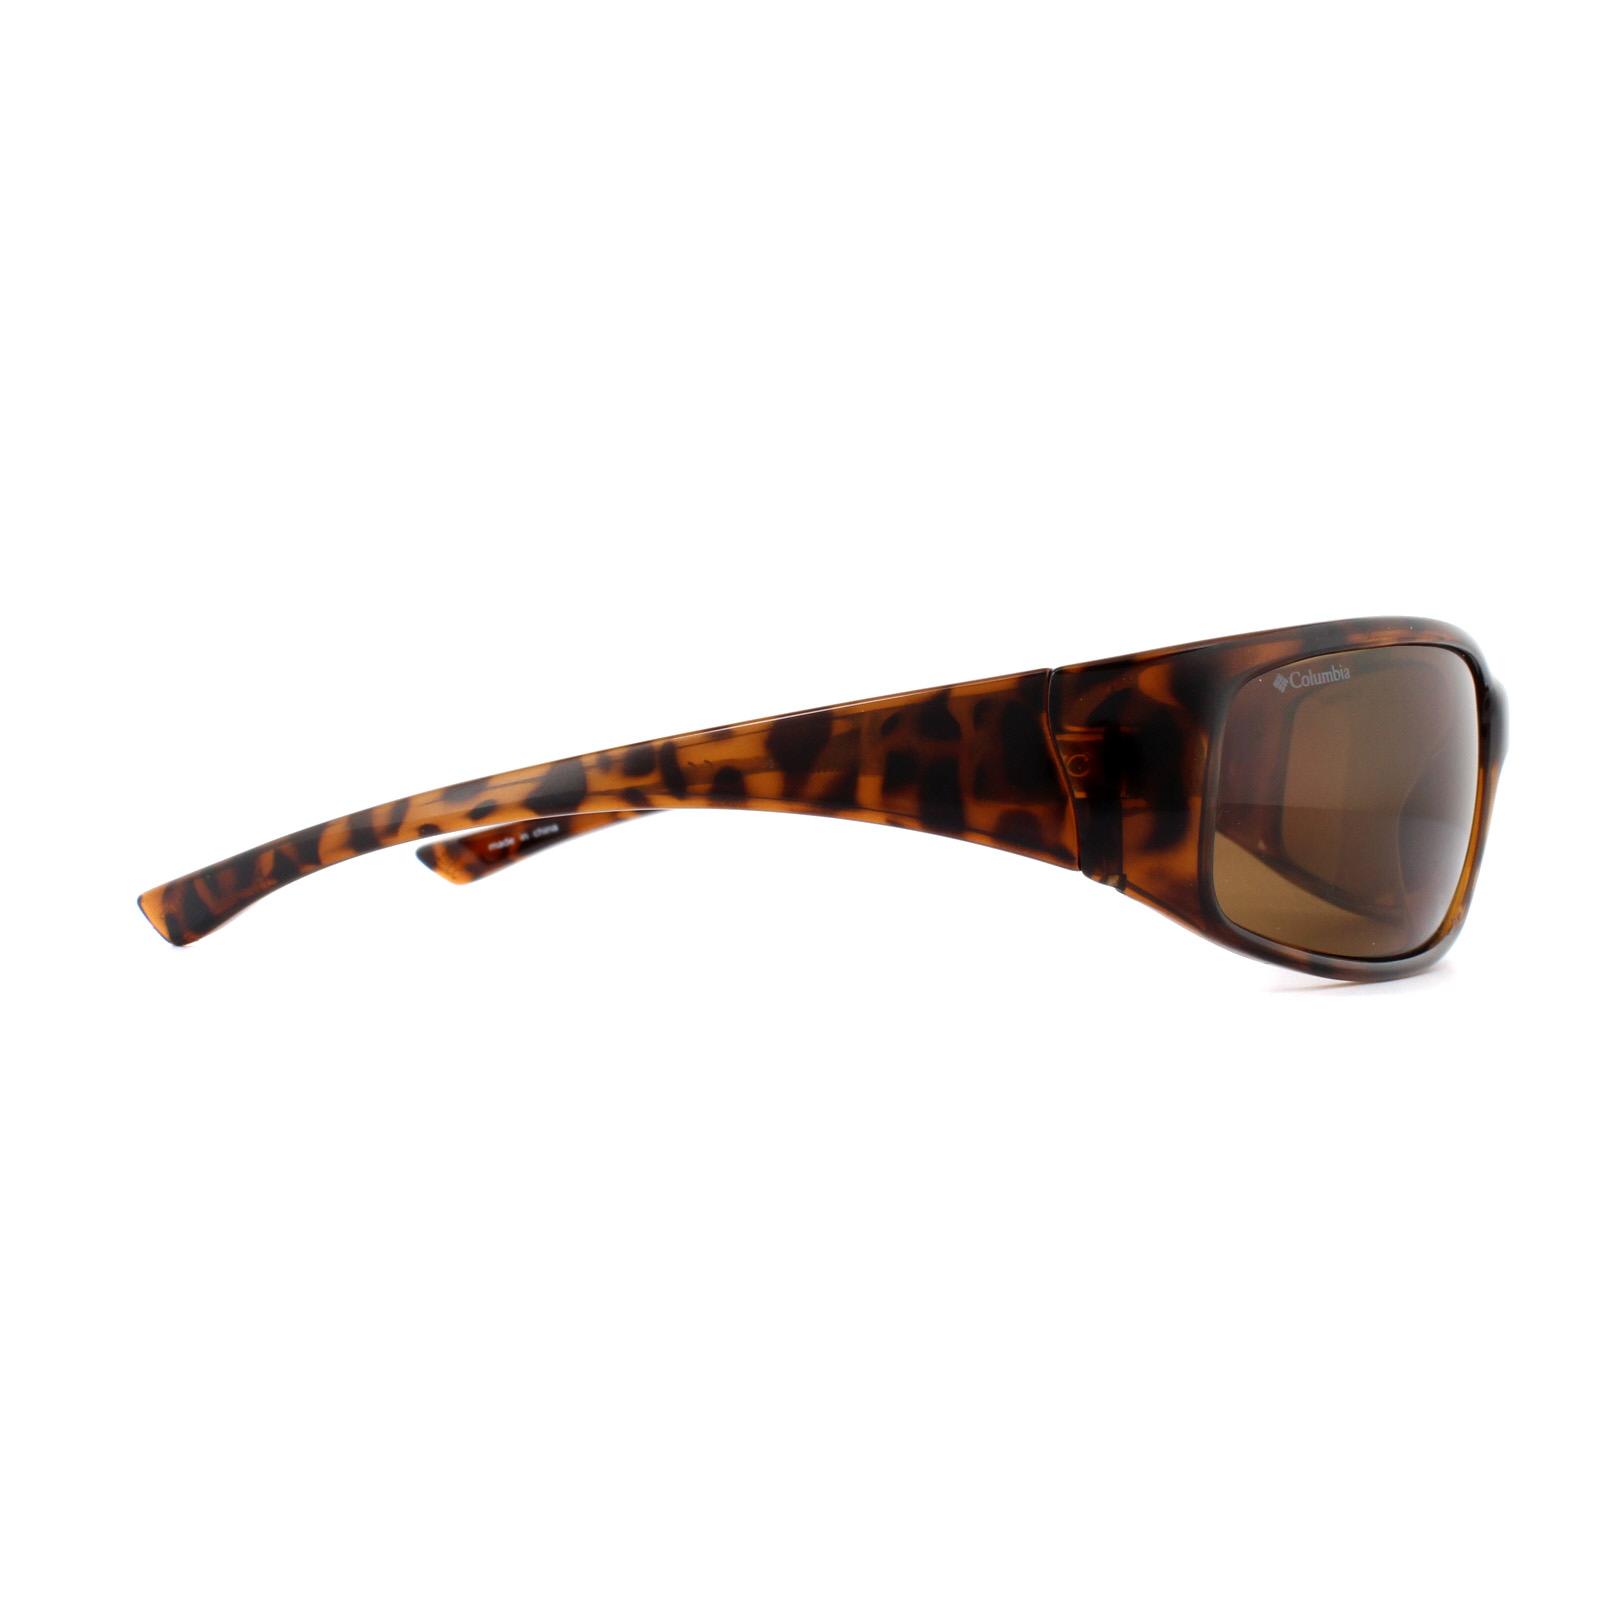 0125533359 Sentinel Thumbnail 3. Sentinel Columbia Sunglasses Auburn C620 Demi Tortoise  Brown. Sentinel Thumbnail 4